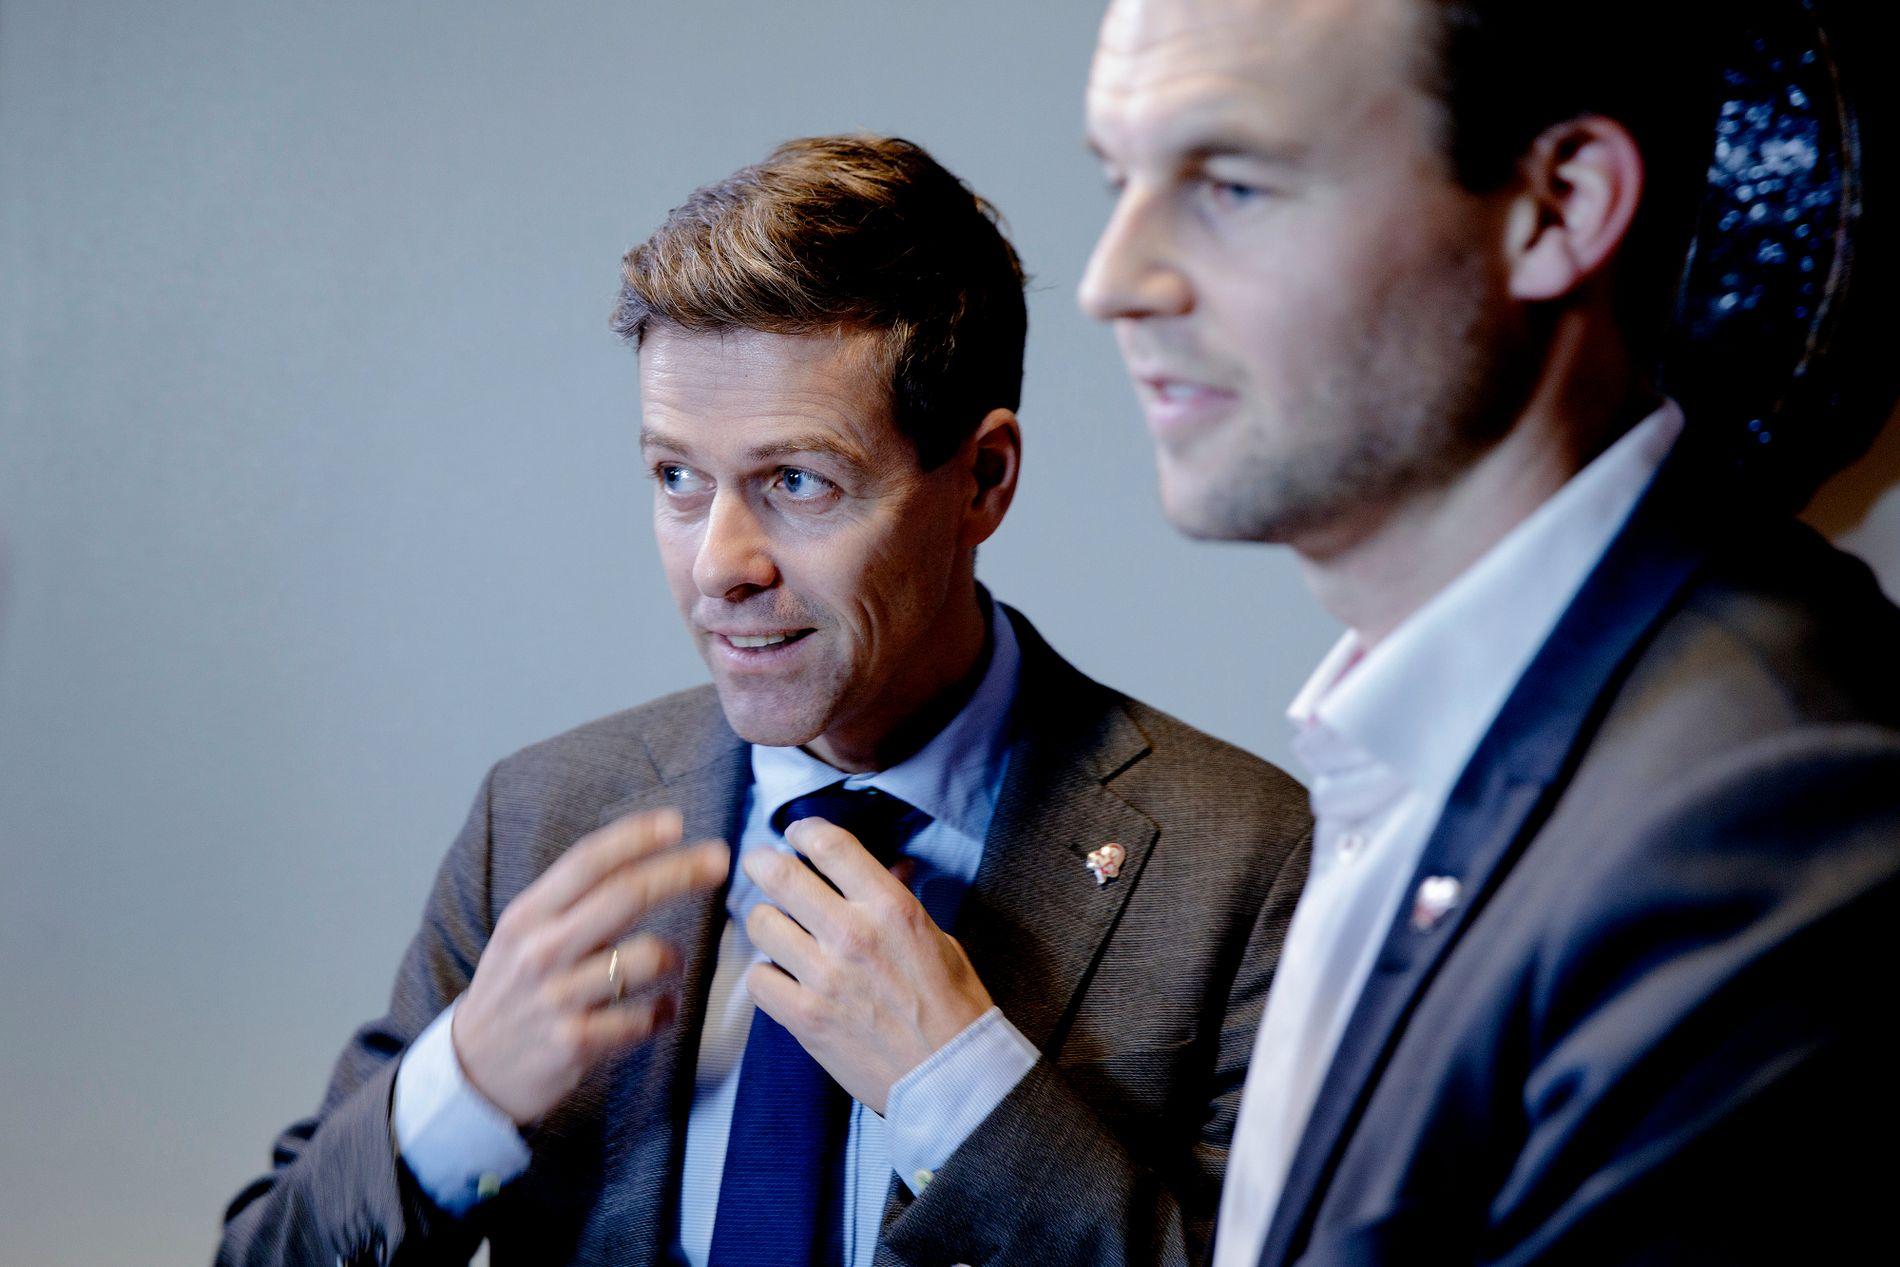 SPLITTET: Hareide og Ropstad er dypt uenige om partiets retningsvalg.